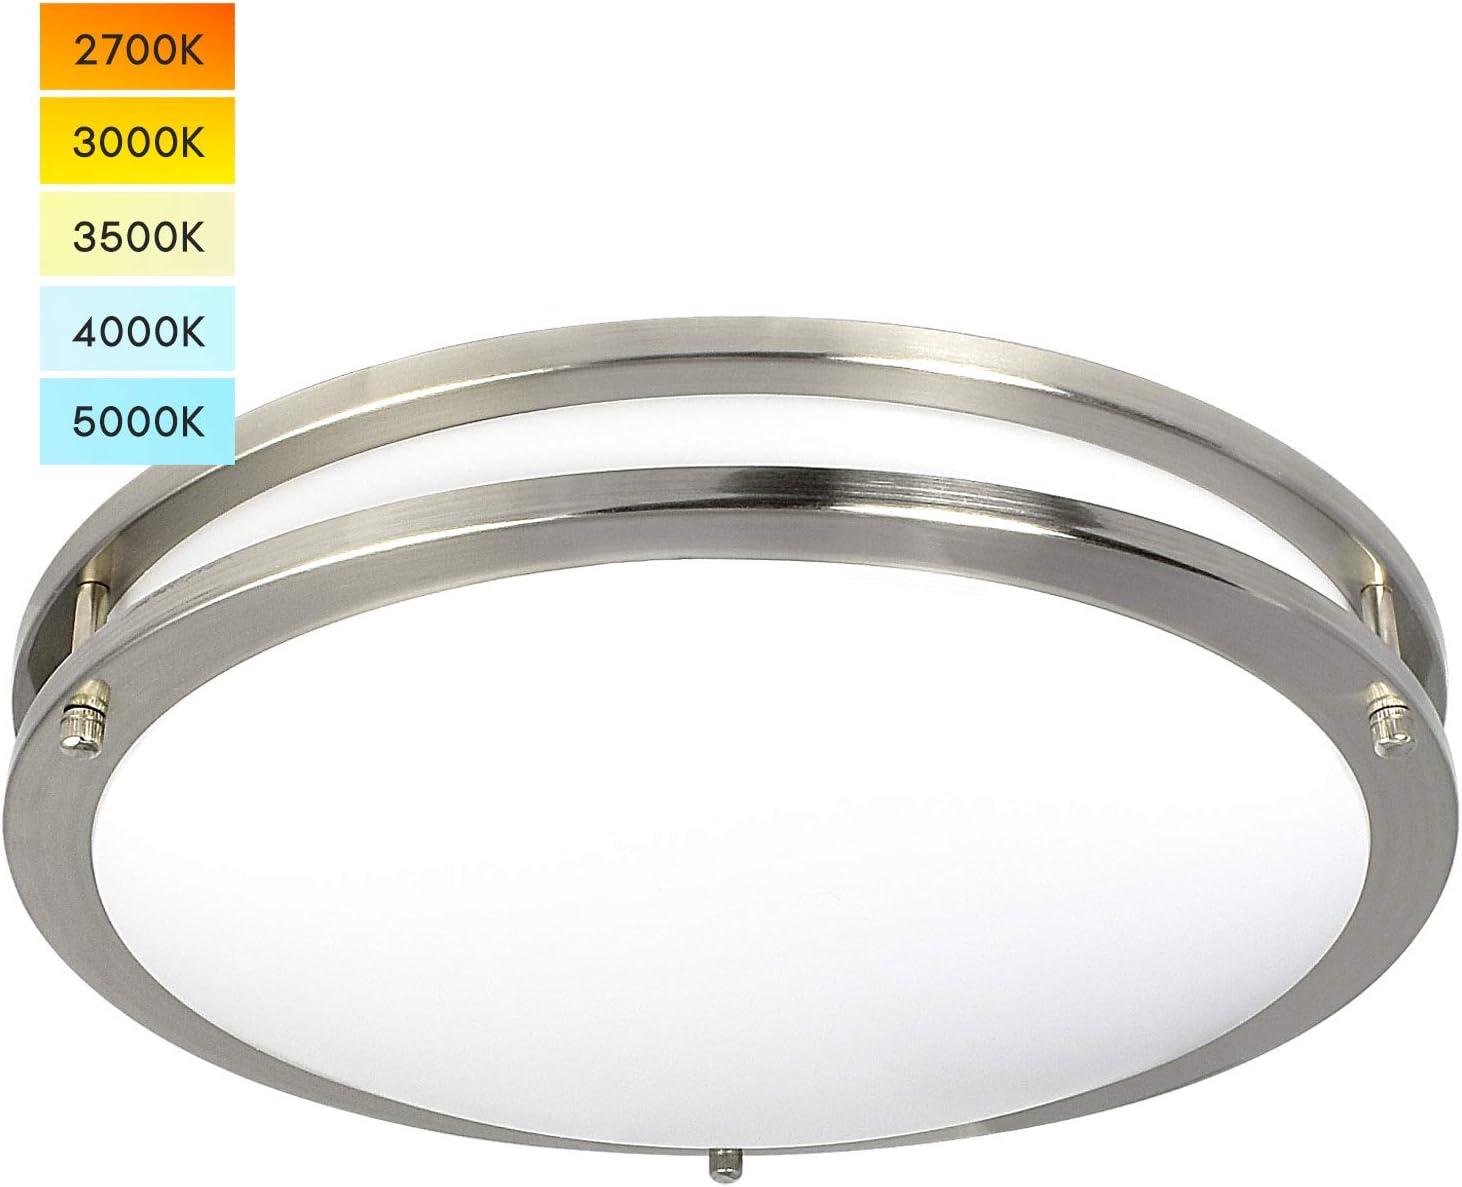 Luxrite 16 Inch LED Flush Mount Ceiling Light, CCT Color Temperature Selectable 2700K   3000K   3500K   4000K   5000K, Dimmable Ceiling Light Fixture, 24W, 1960 Lumens, Energy Star, ETL Listed